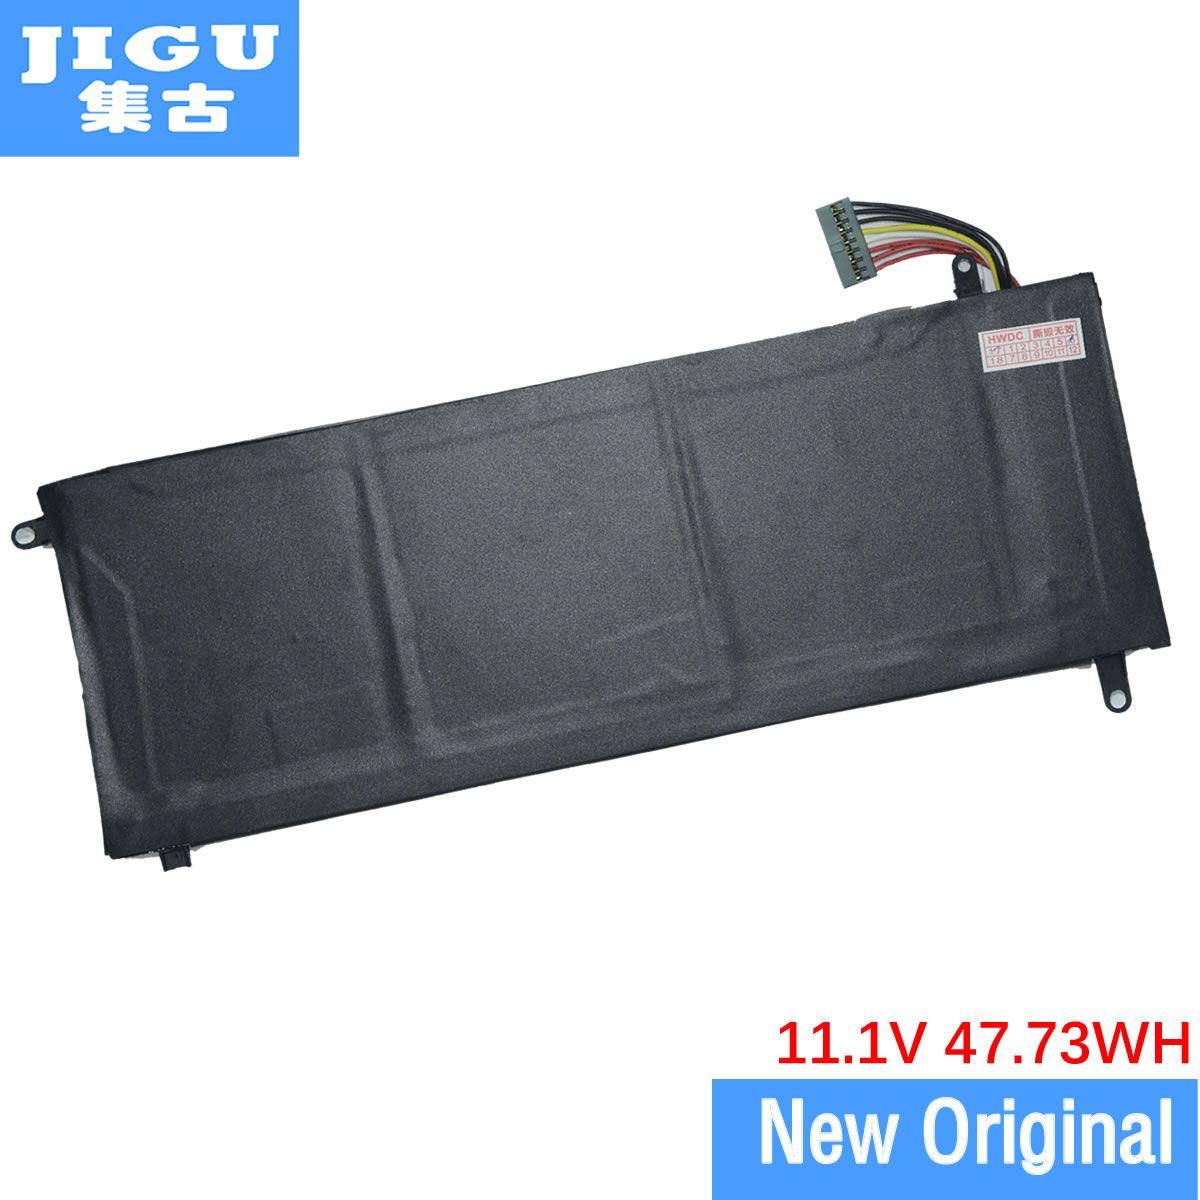 JIGU Neue 11,1 V 4300 mAh 47.73Wh Laptop Batterie GNC-C30 961TA002F für GIGABYTE U2442 U24F P34G V2 Hohe Qualität